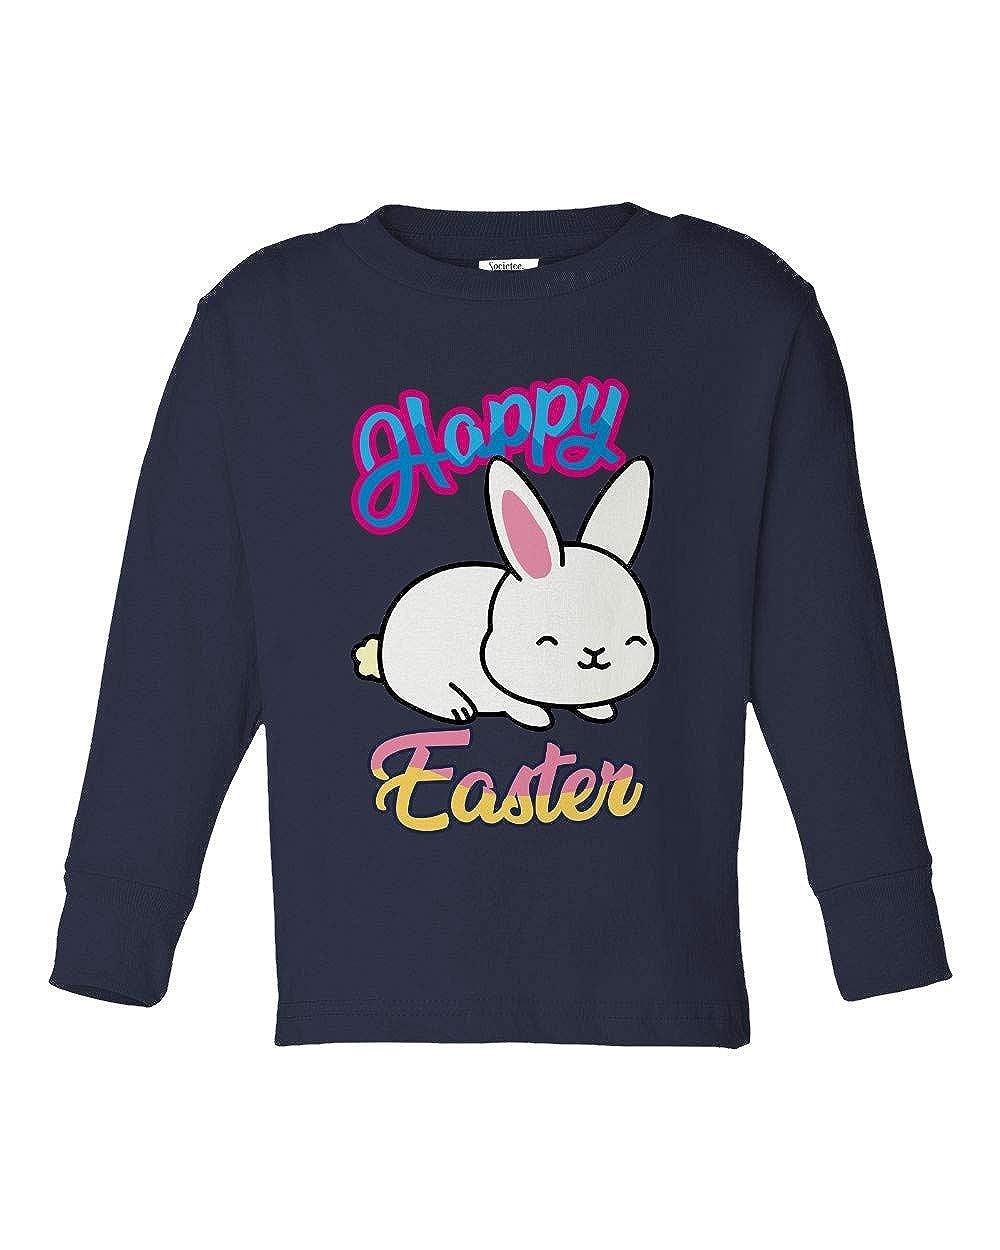 Societee Happy Easter Bunny Cute Adorable Girls Boys Toddler Long Sleeve T-Shirt